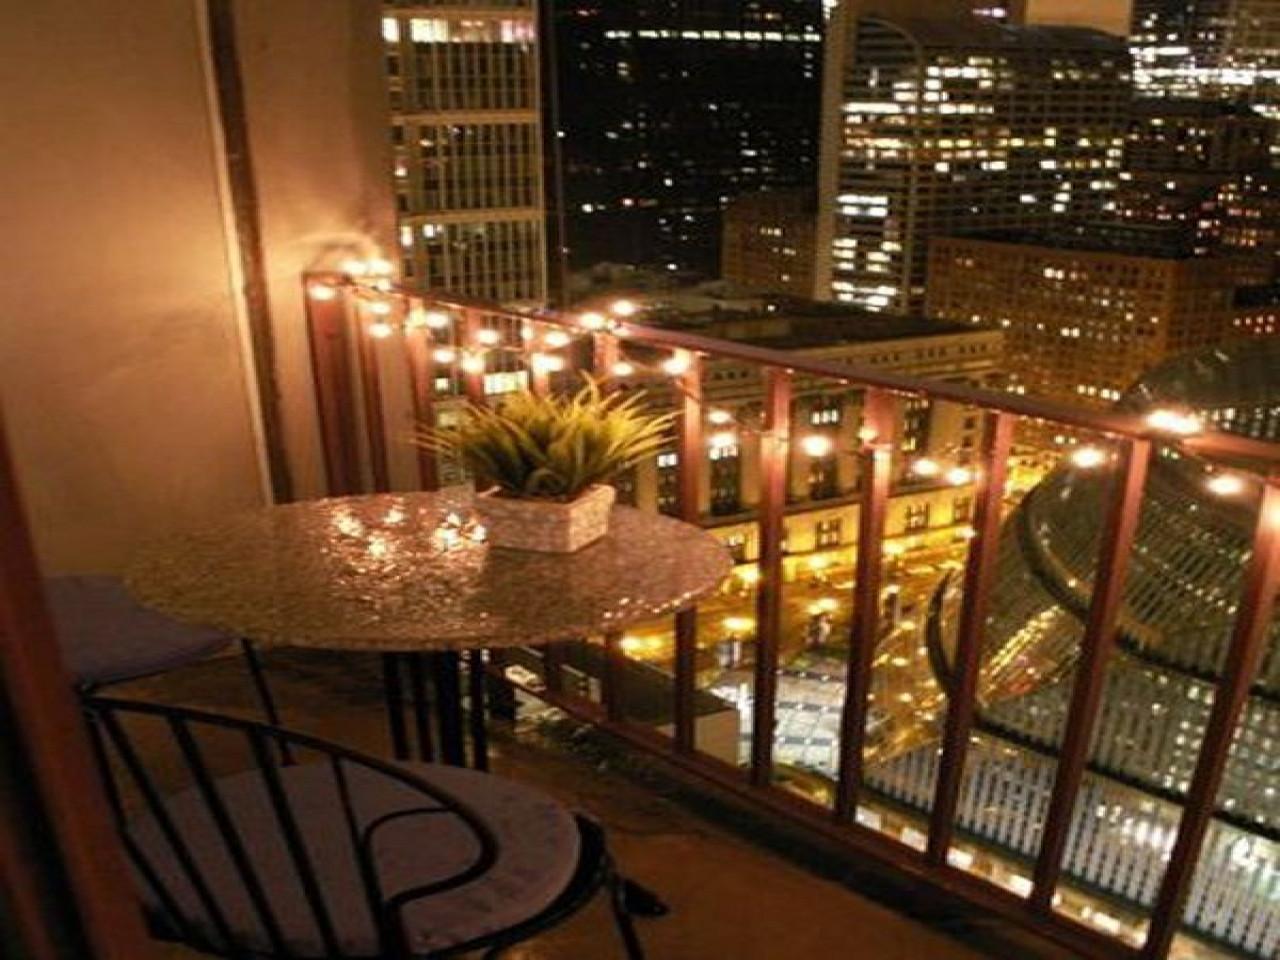 Apartment Balcony Christmas Lights  Christmas light decor idea small balcony ideas about